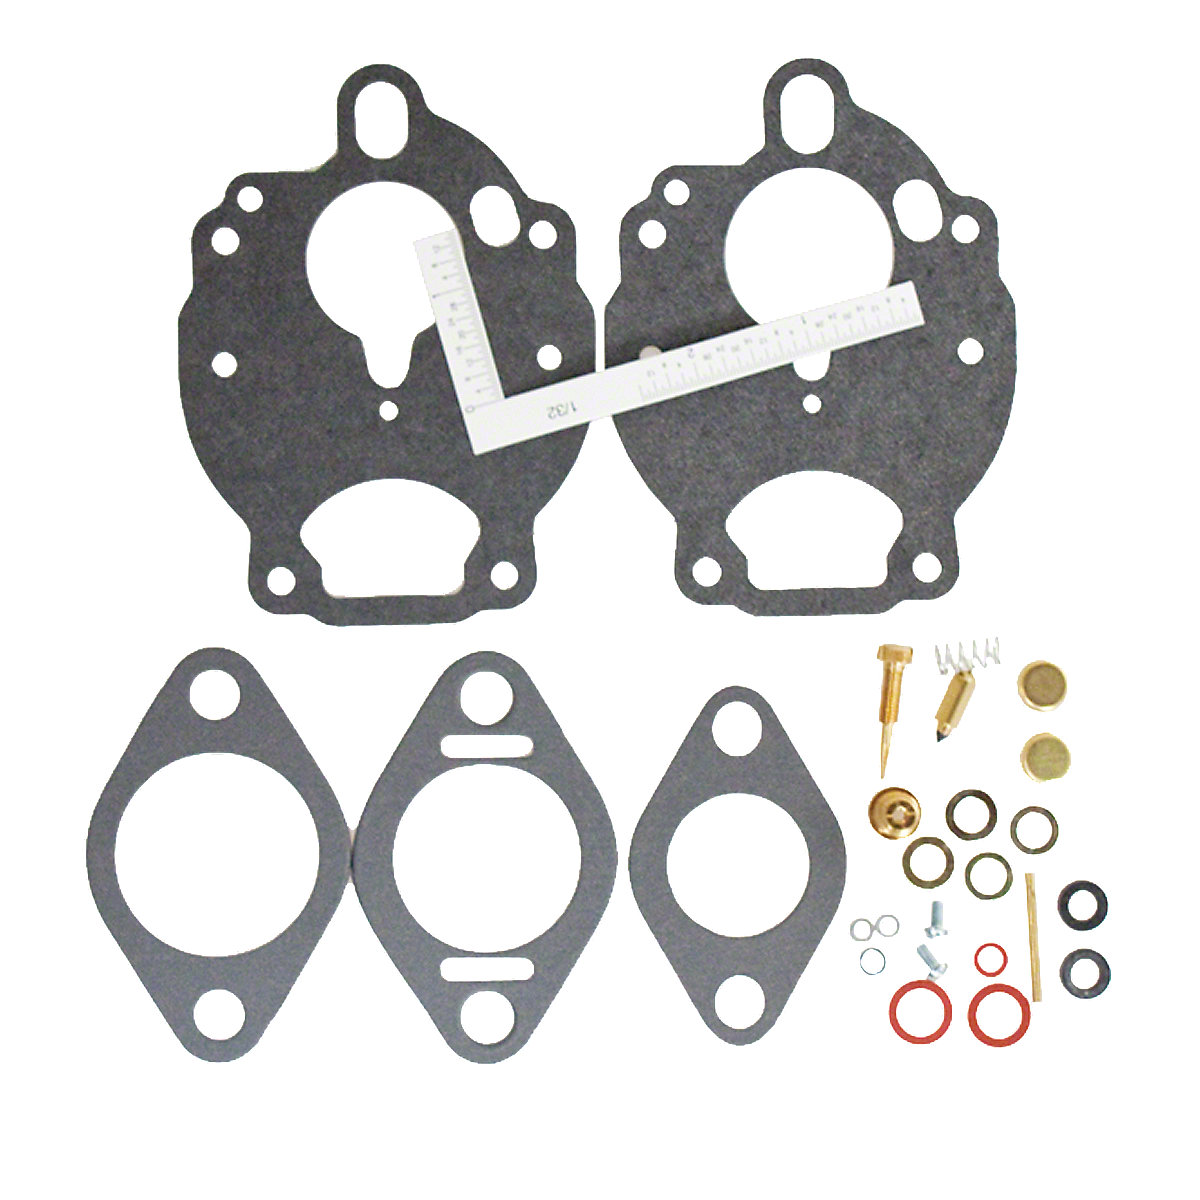 ABC1349Economy Zenith Carburetor Repair Kit